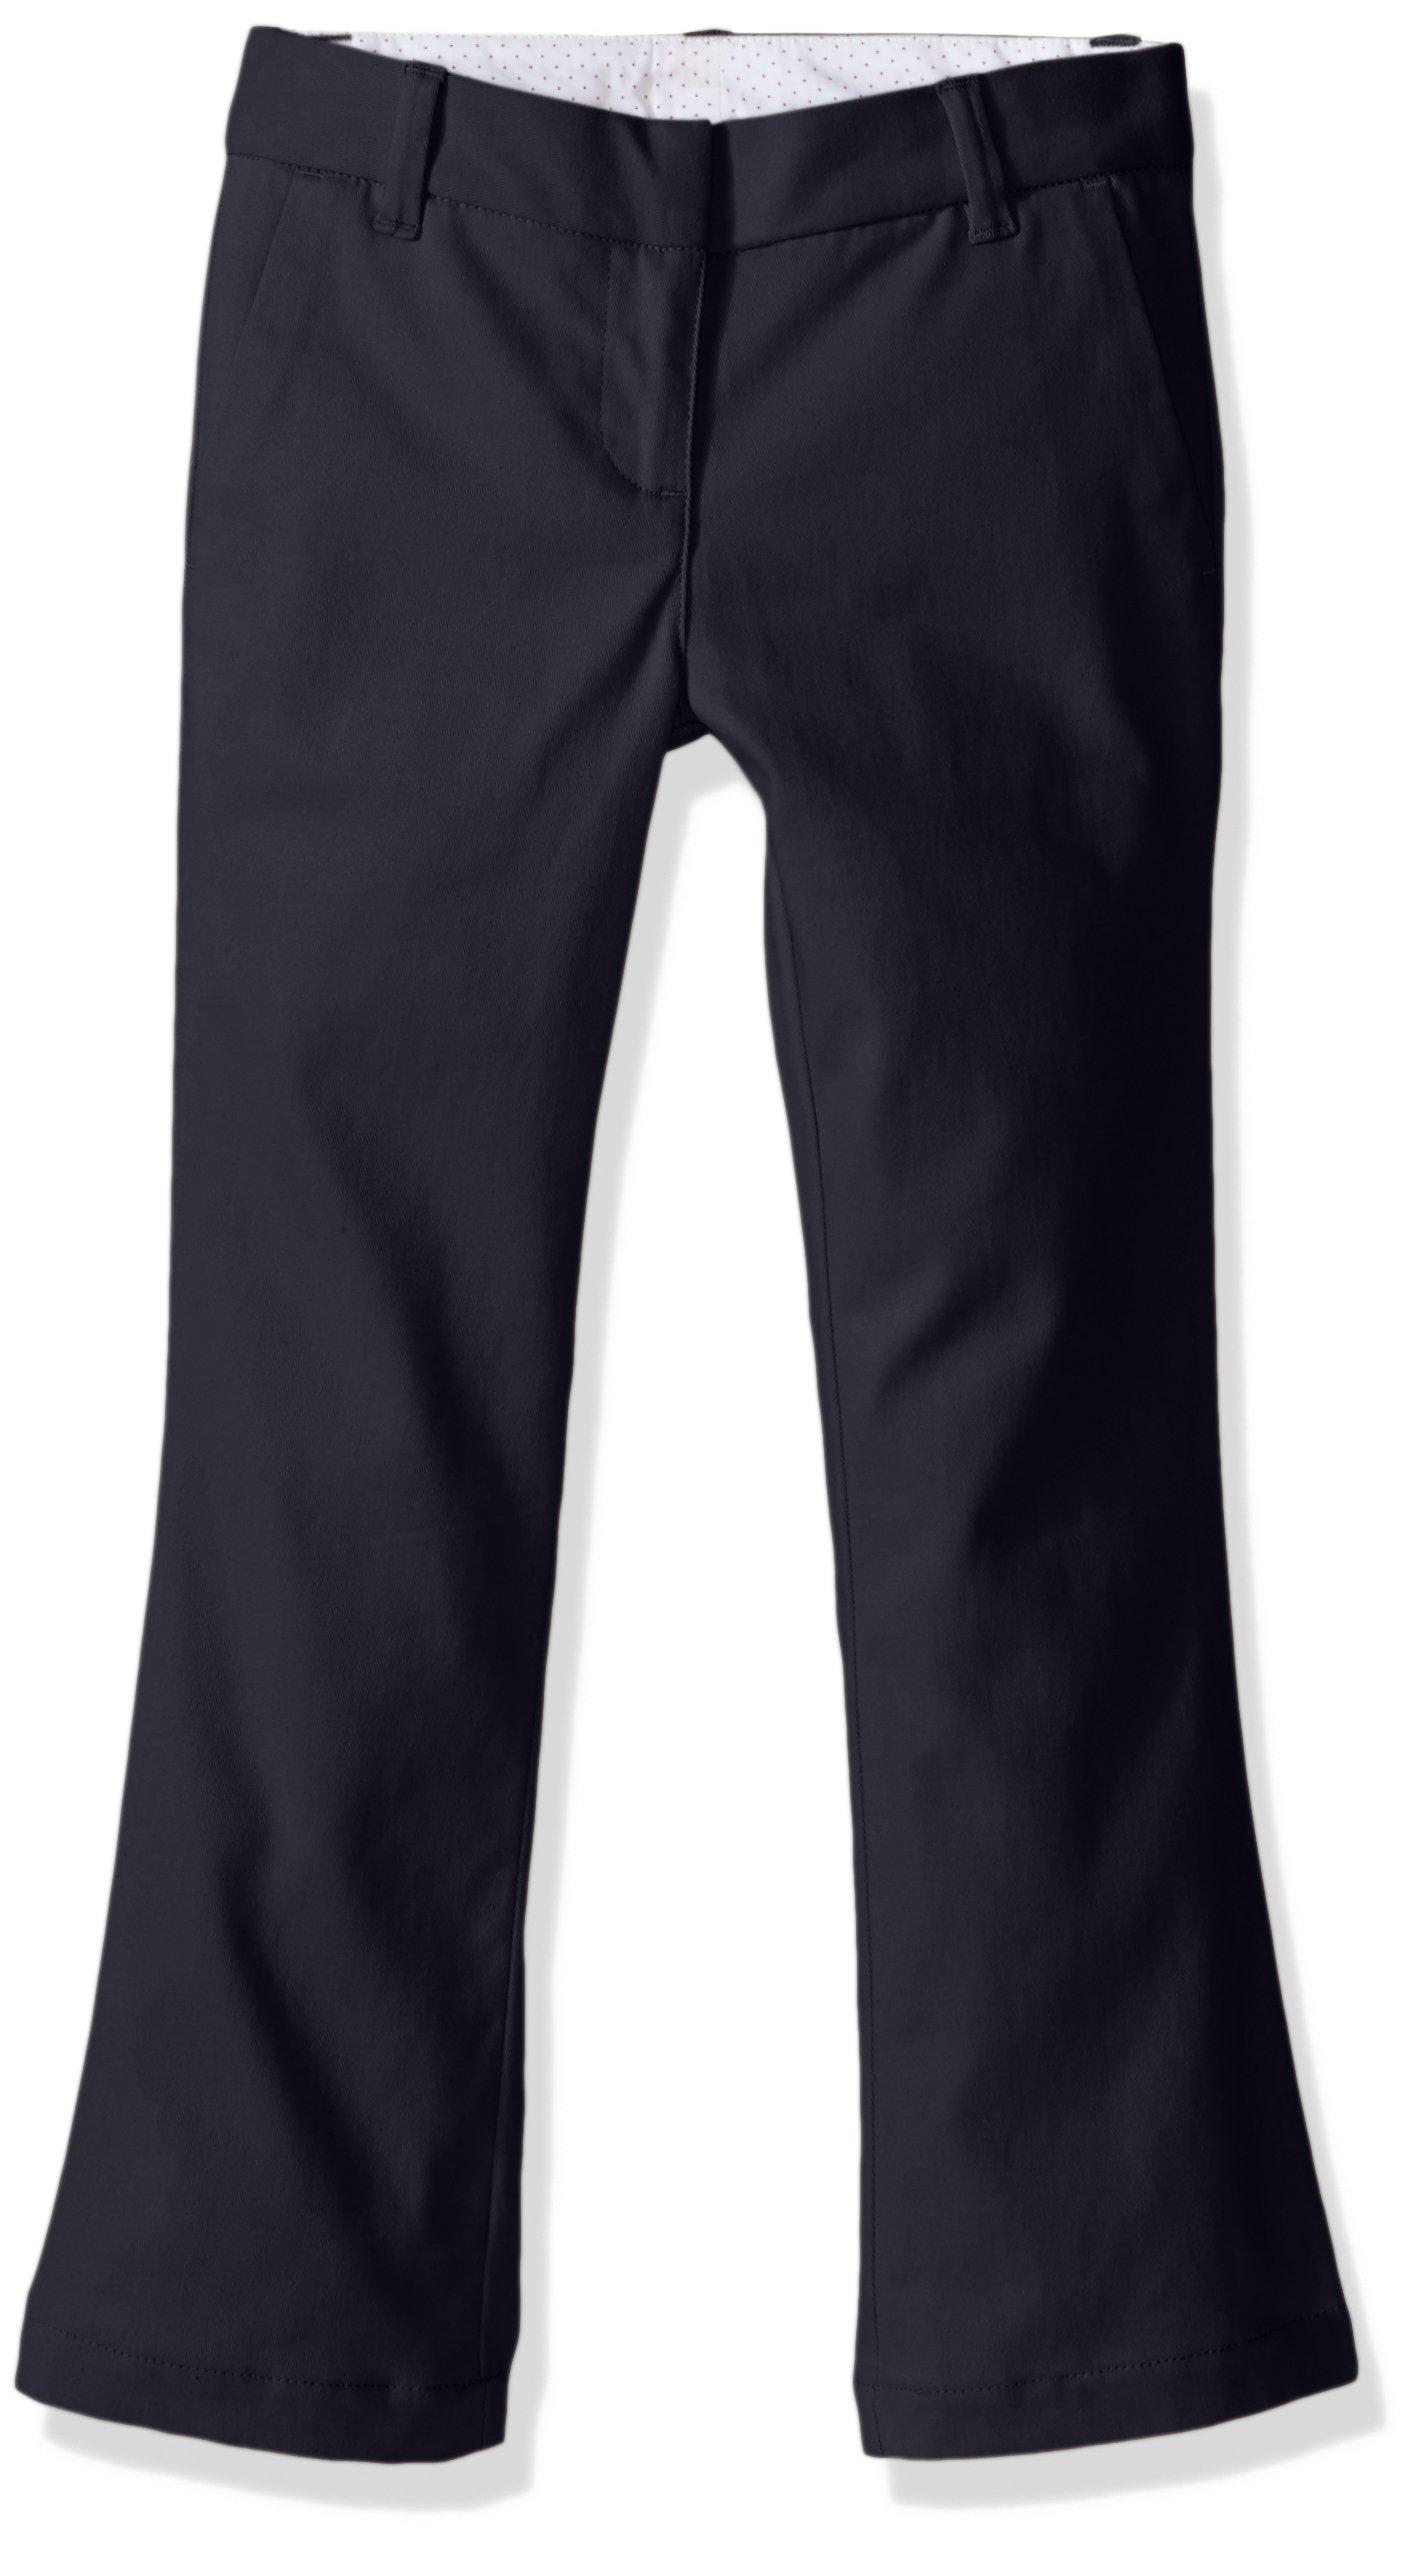 Dockers Little Girls' Uniform Skinny Bootcut, Navy, 6